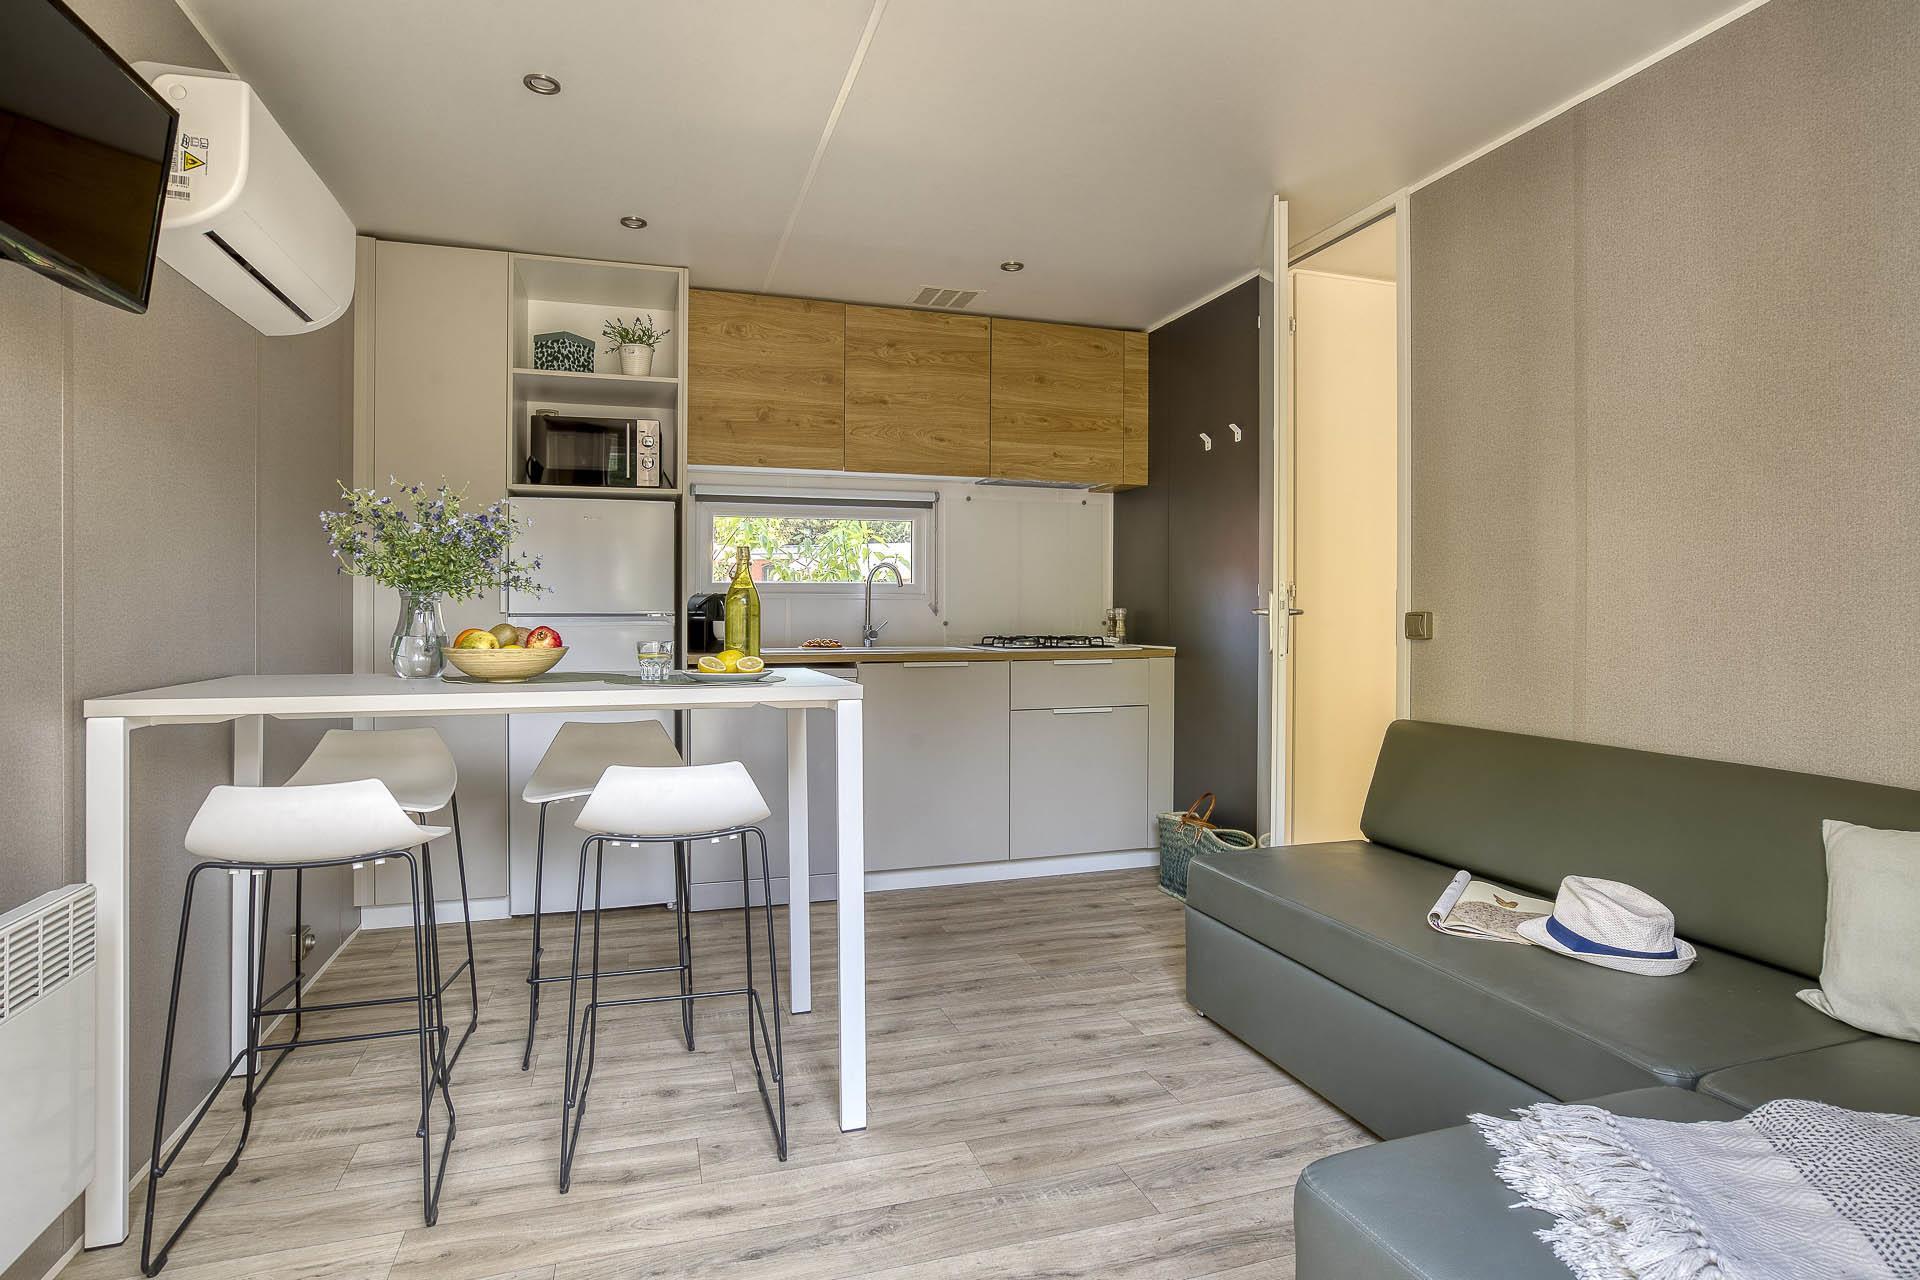 Location - Cottage 2 Chambres 2 Salles De Bain Climatisé**** - Camping Sandaya Blue Bayou